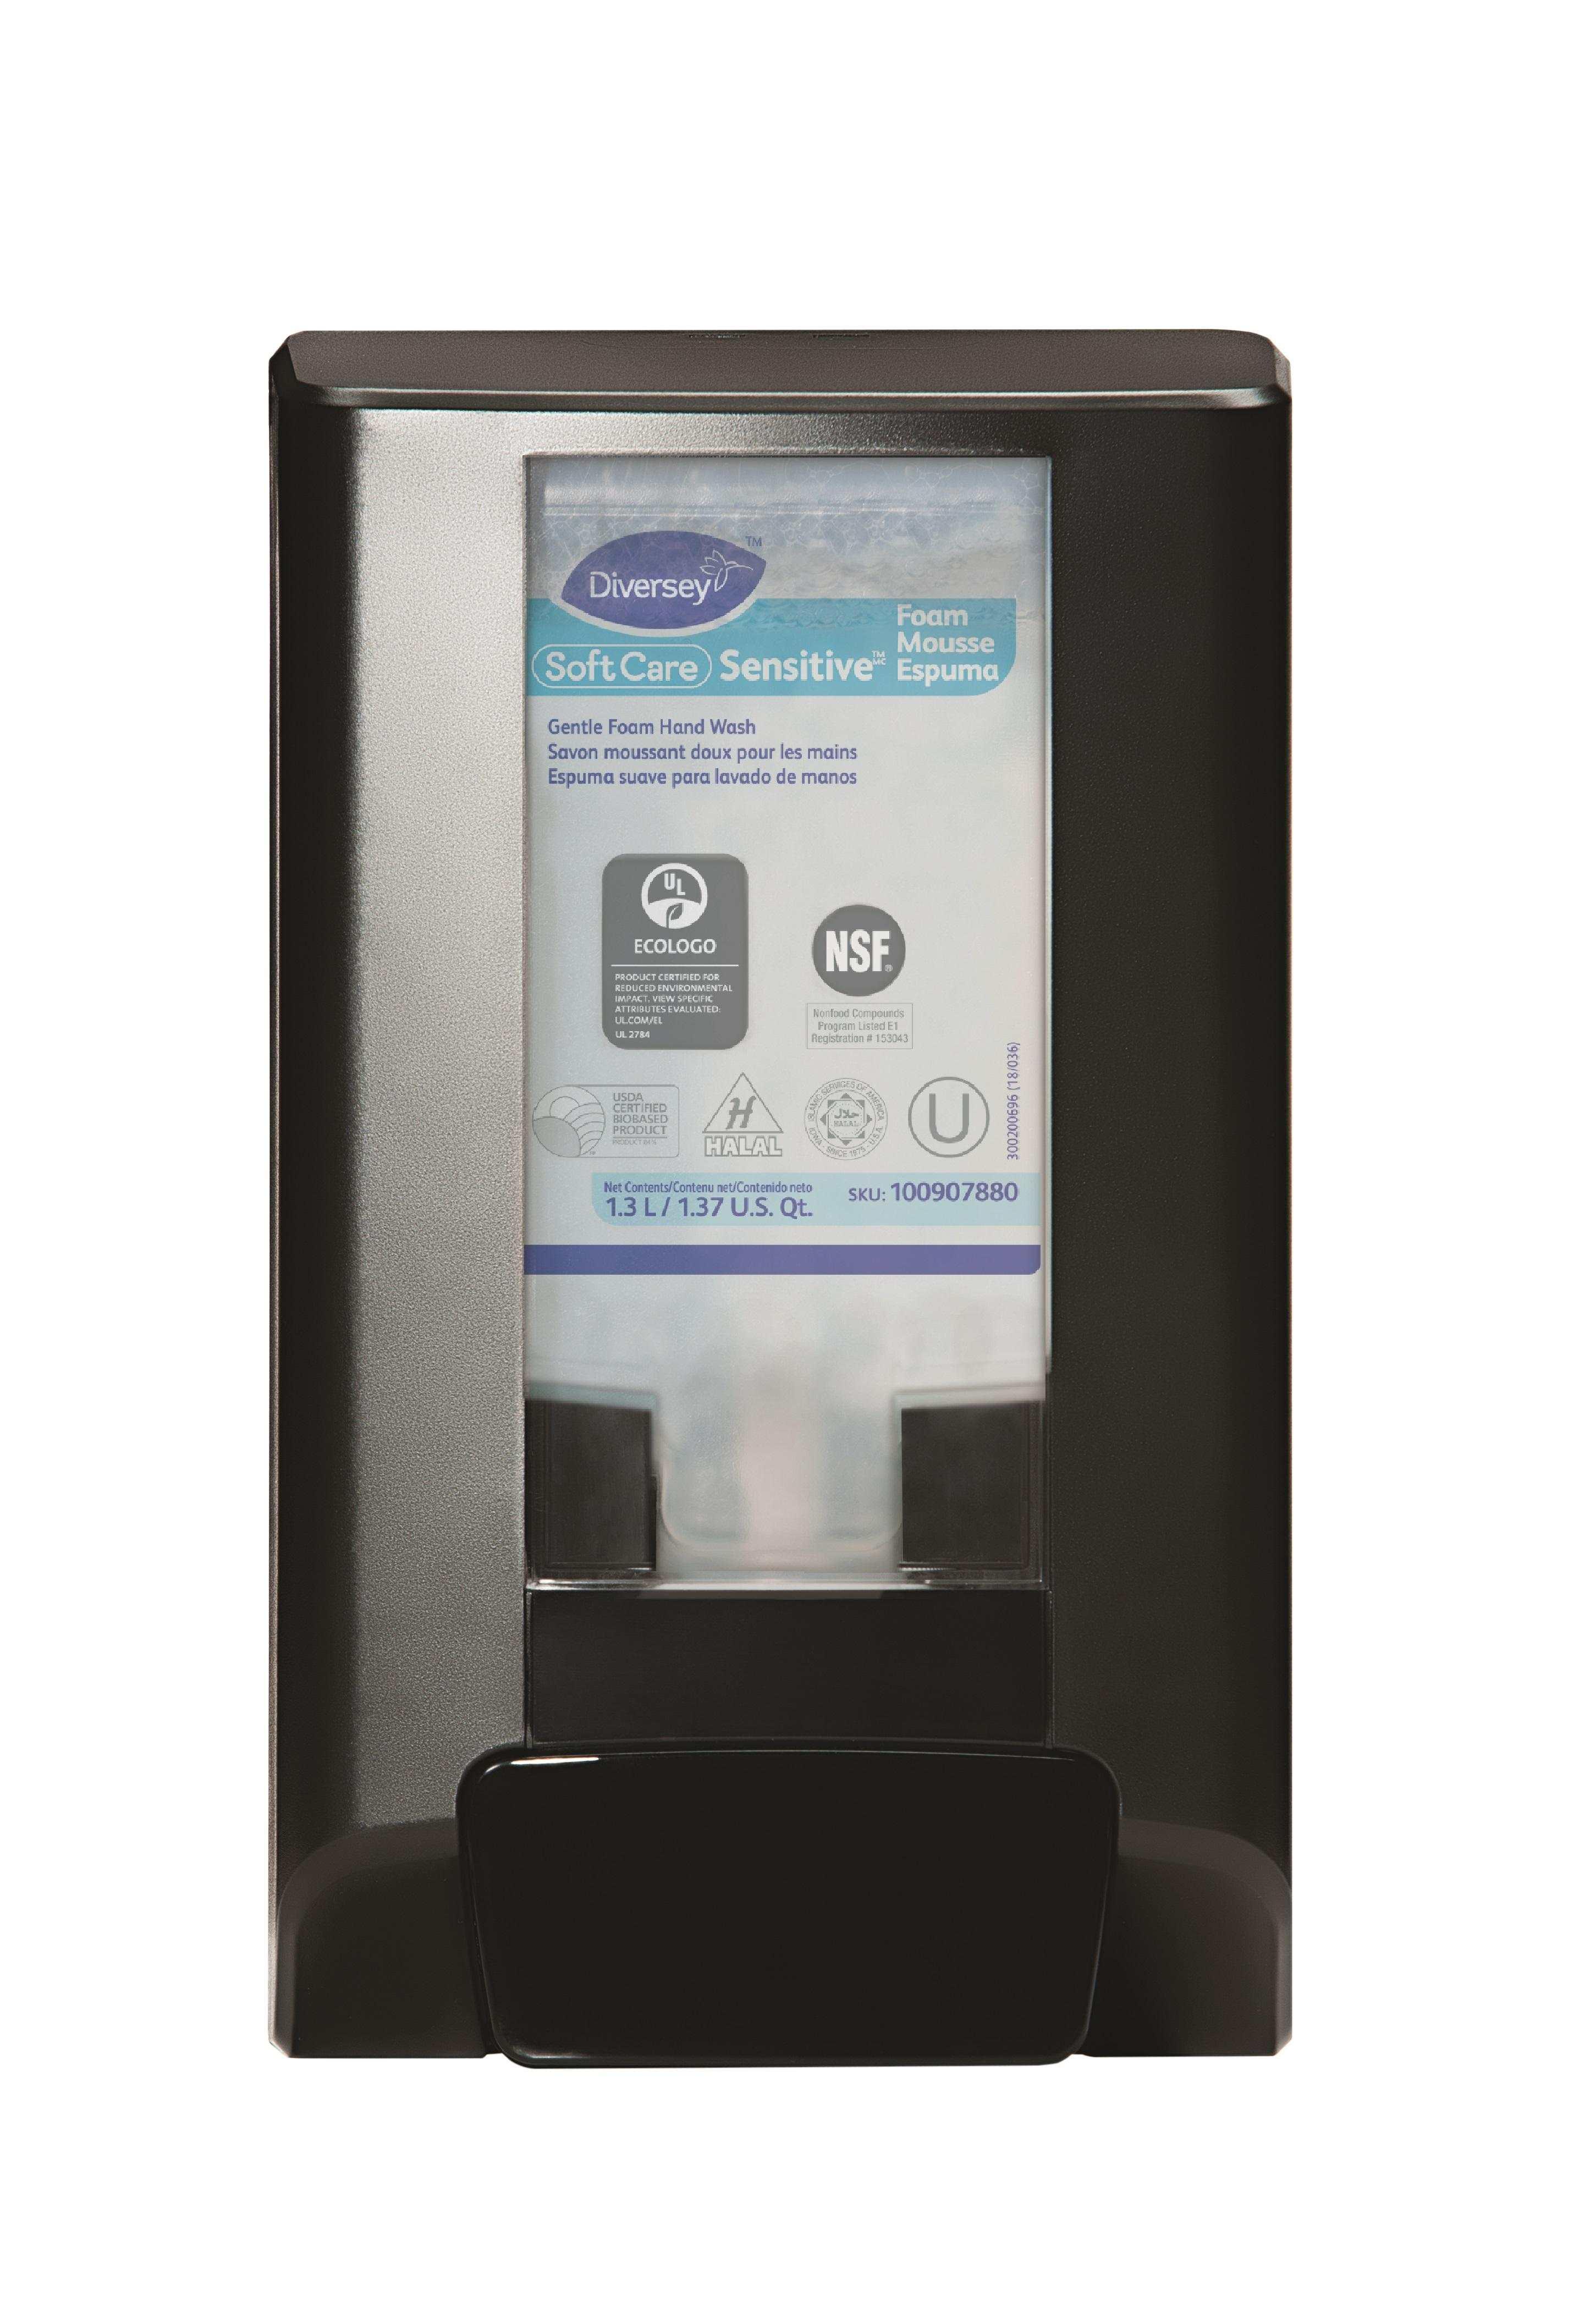 D7524177-IntelliCare-Dispenser-Blk-Front-Manual.jpg